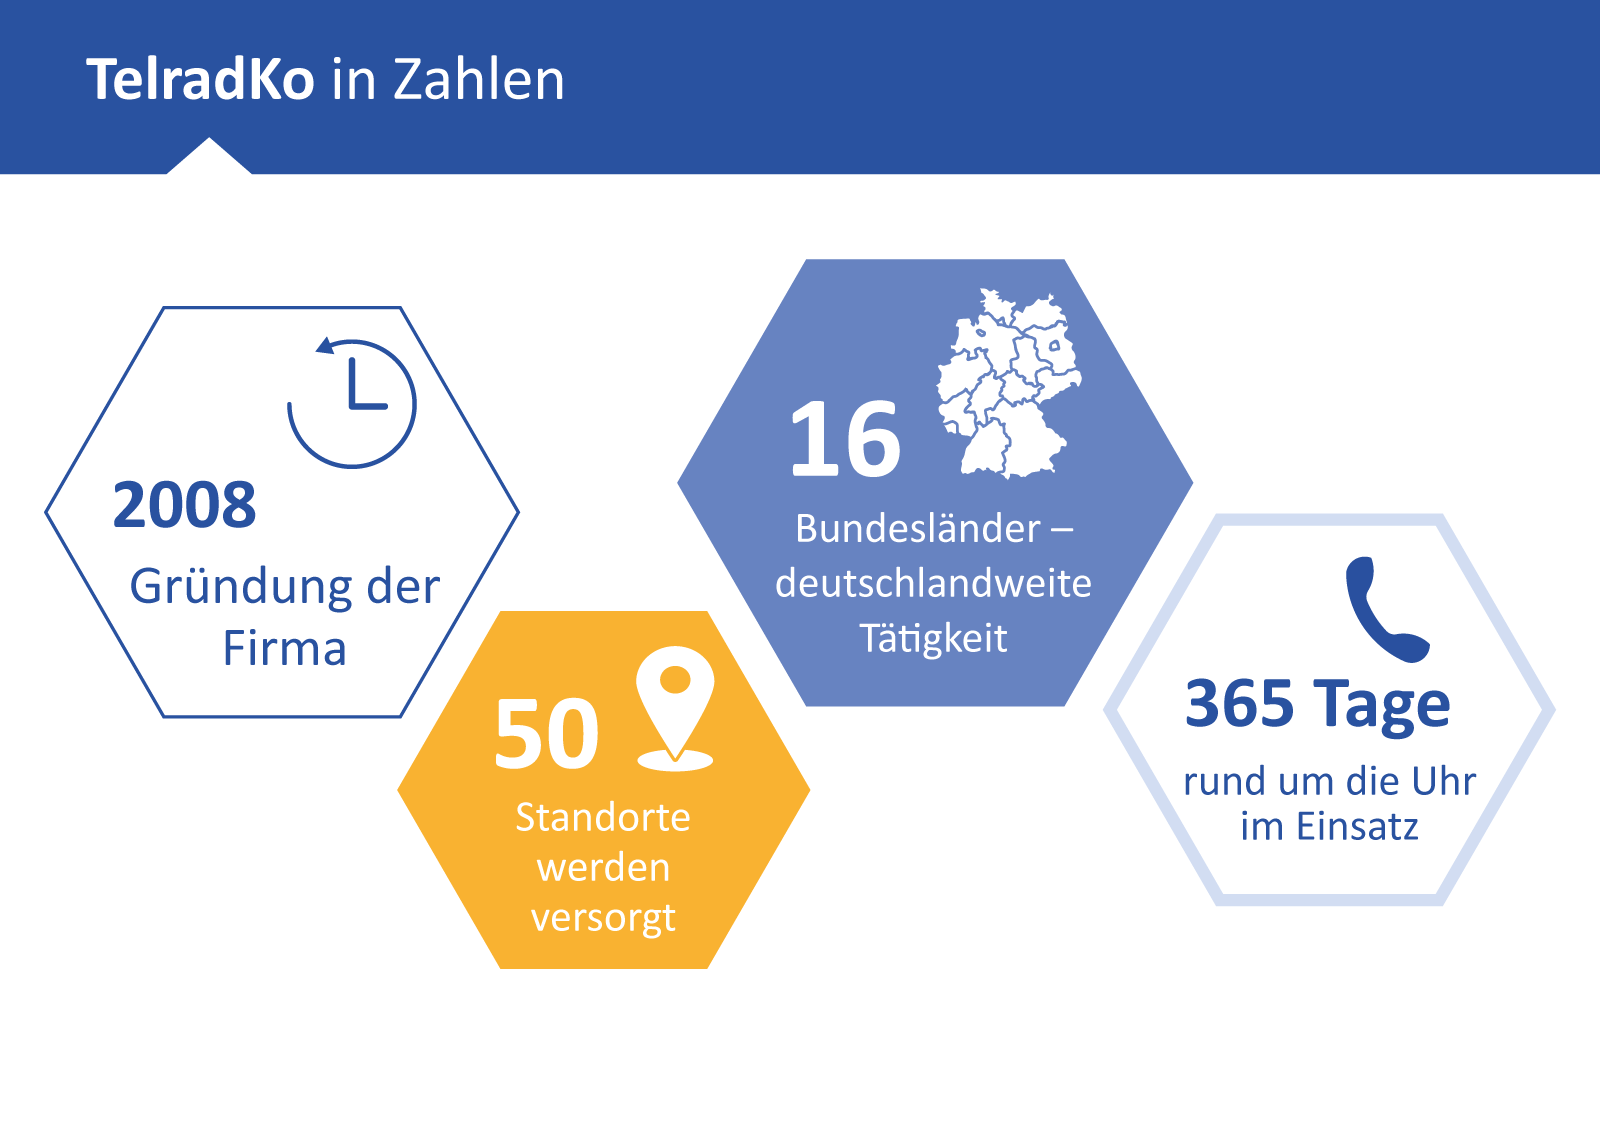 portrino Website Relaunch: TelradKo in Zahlen